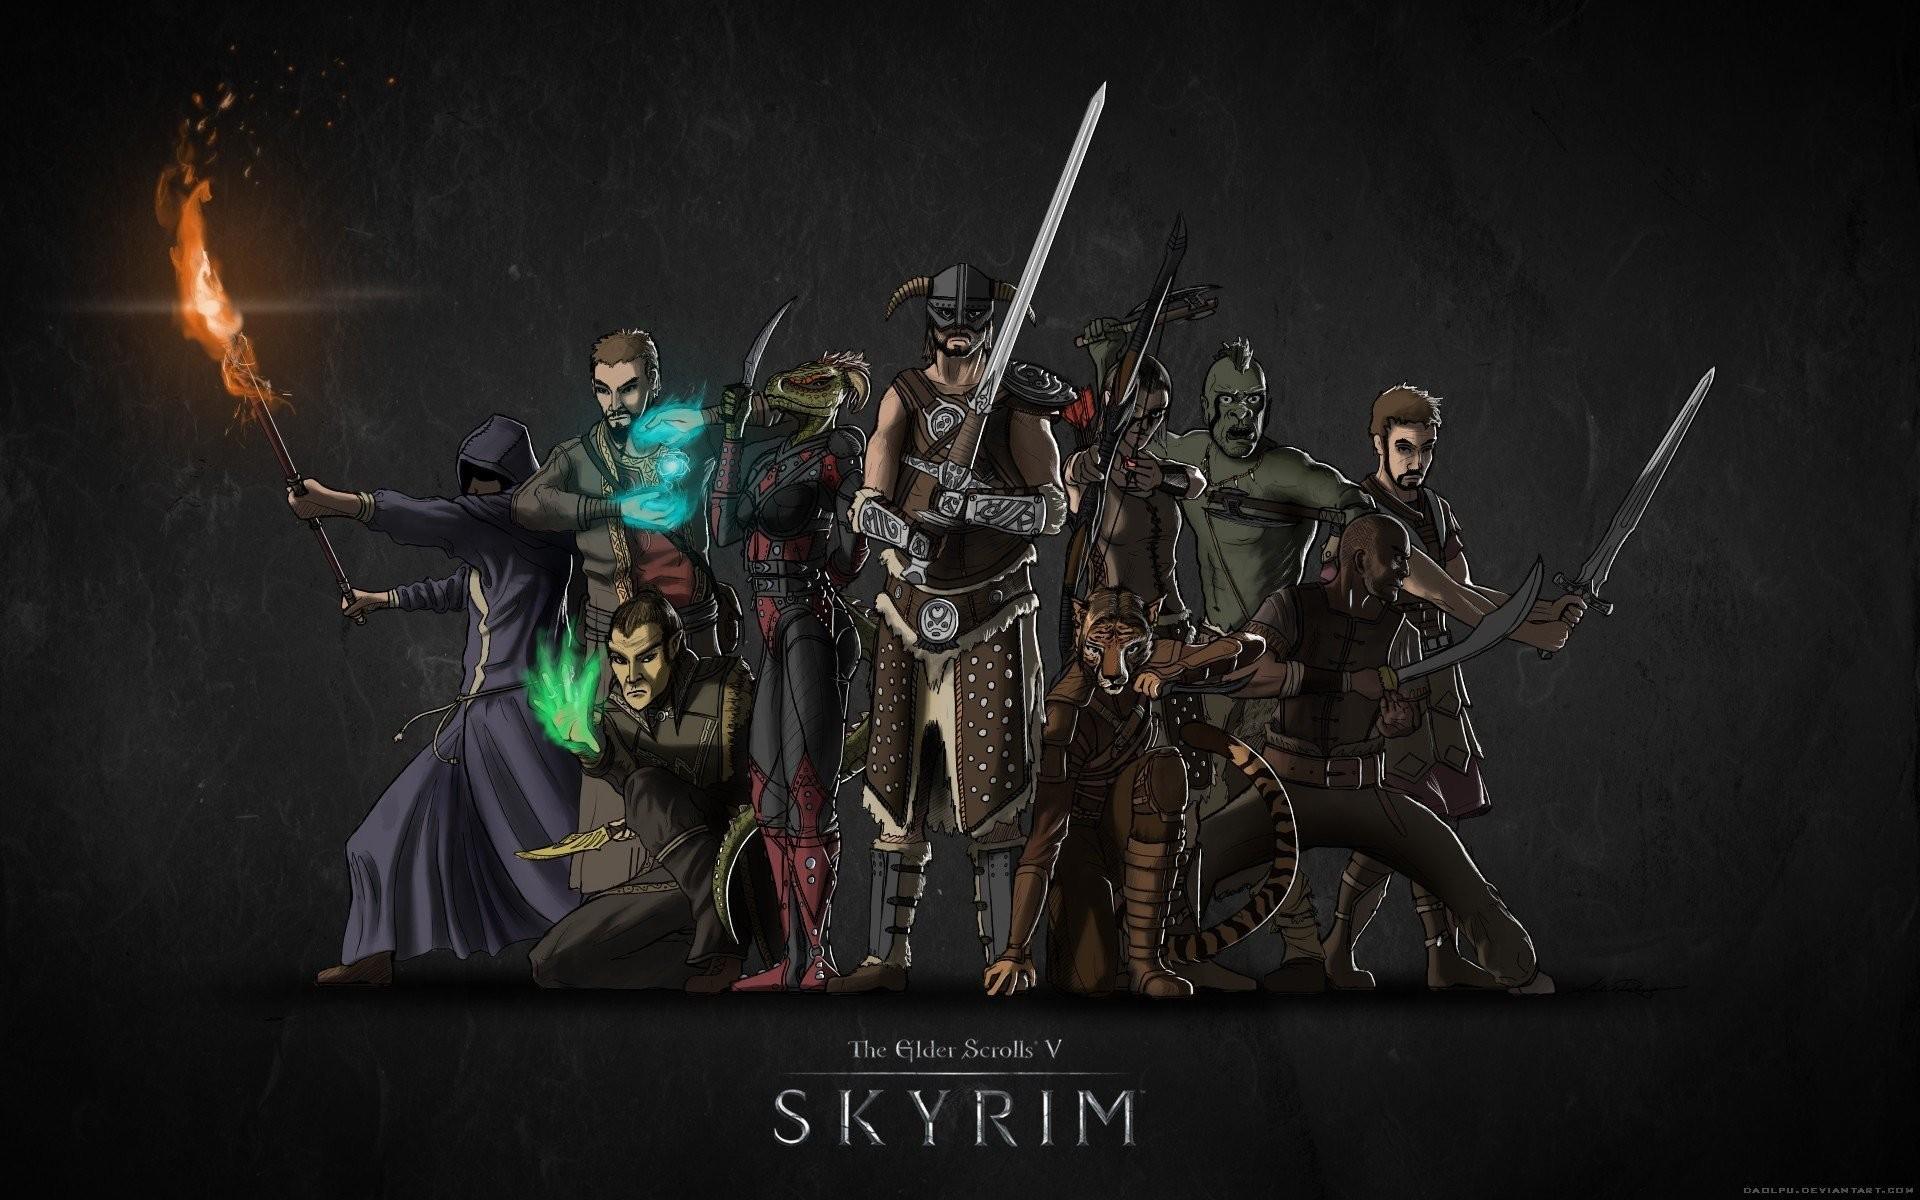 the elder scrolls 5 skyrim skyrim nord khajiit an imperial wood elf high  elf ork breton